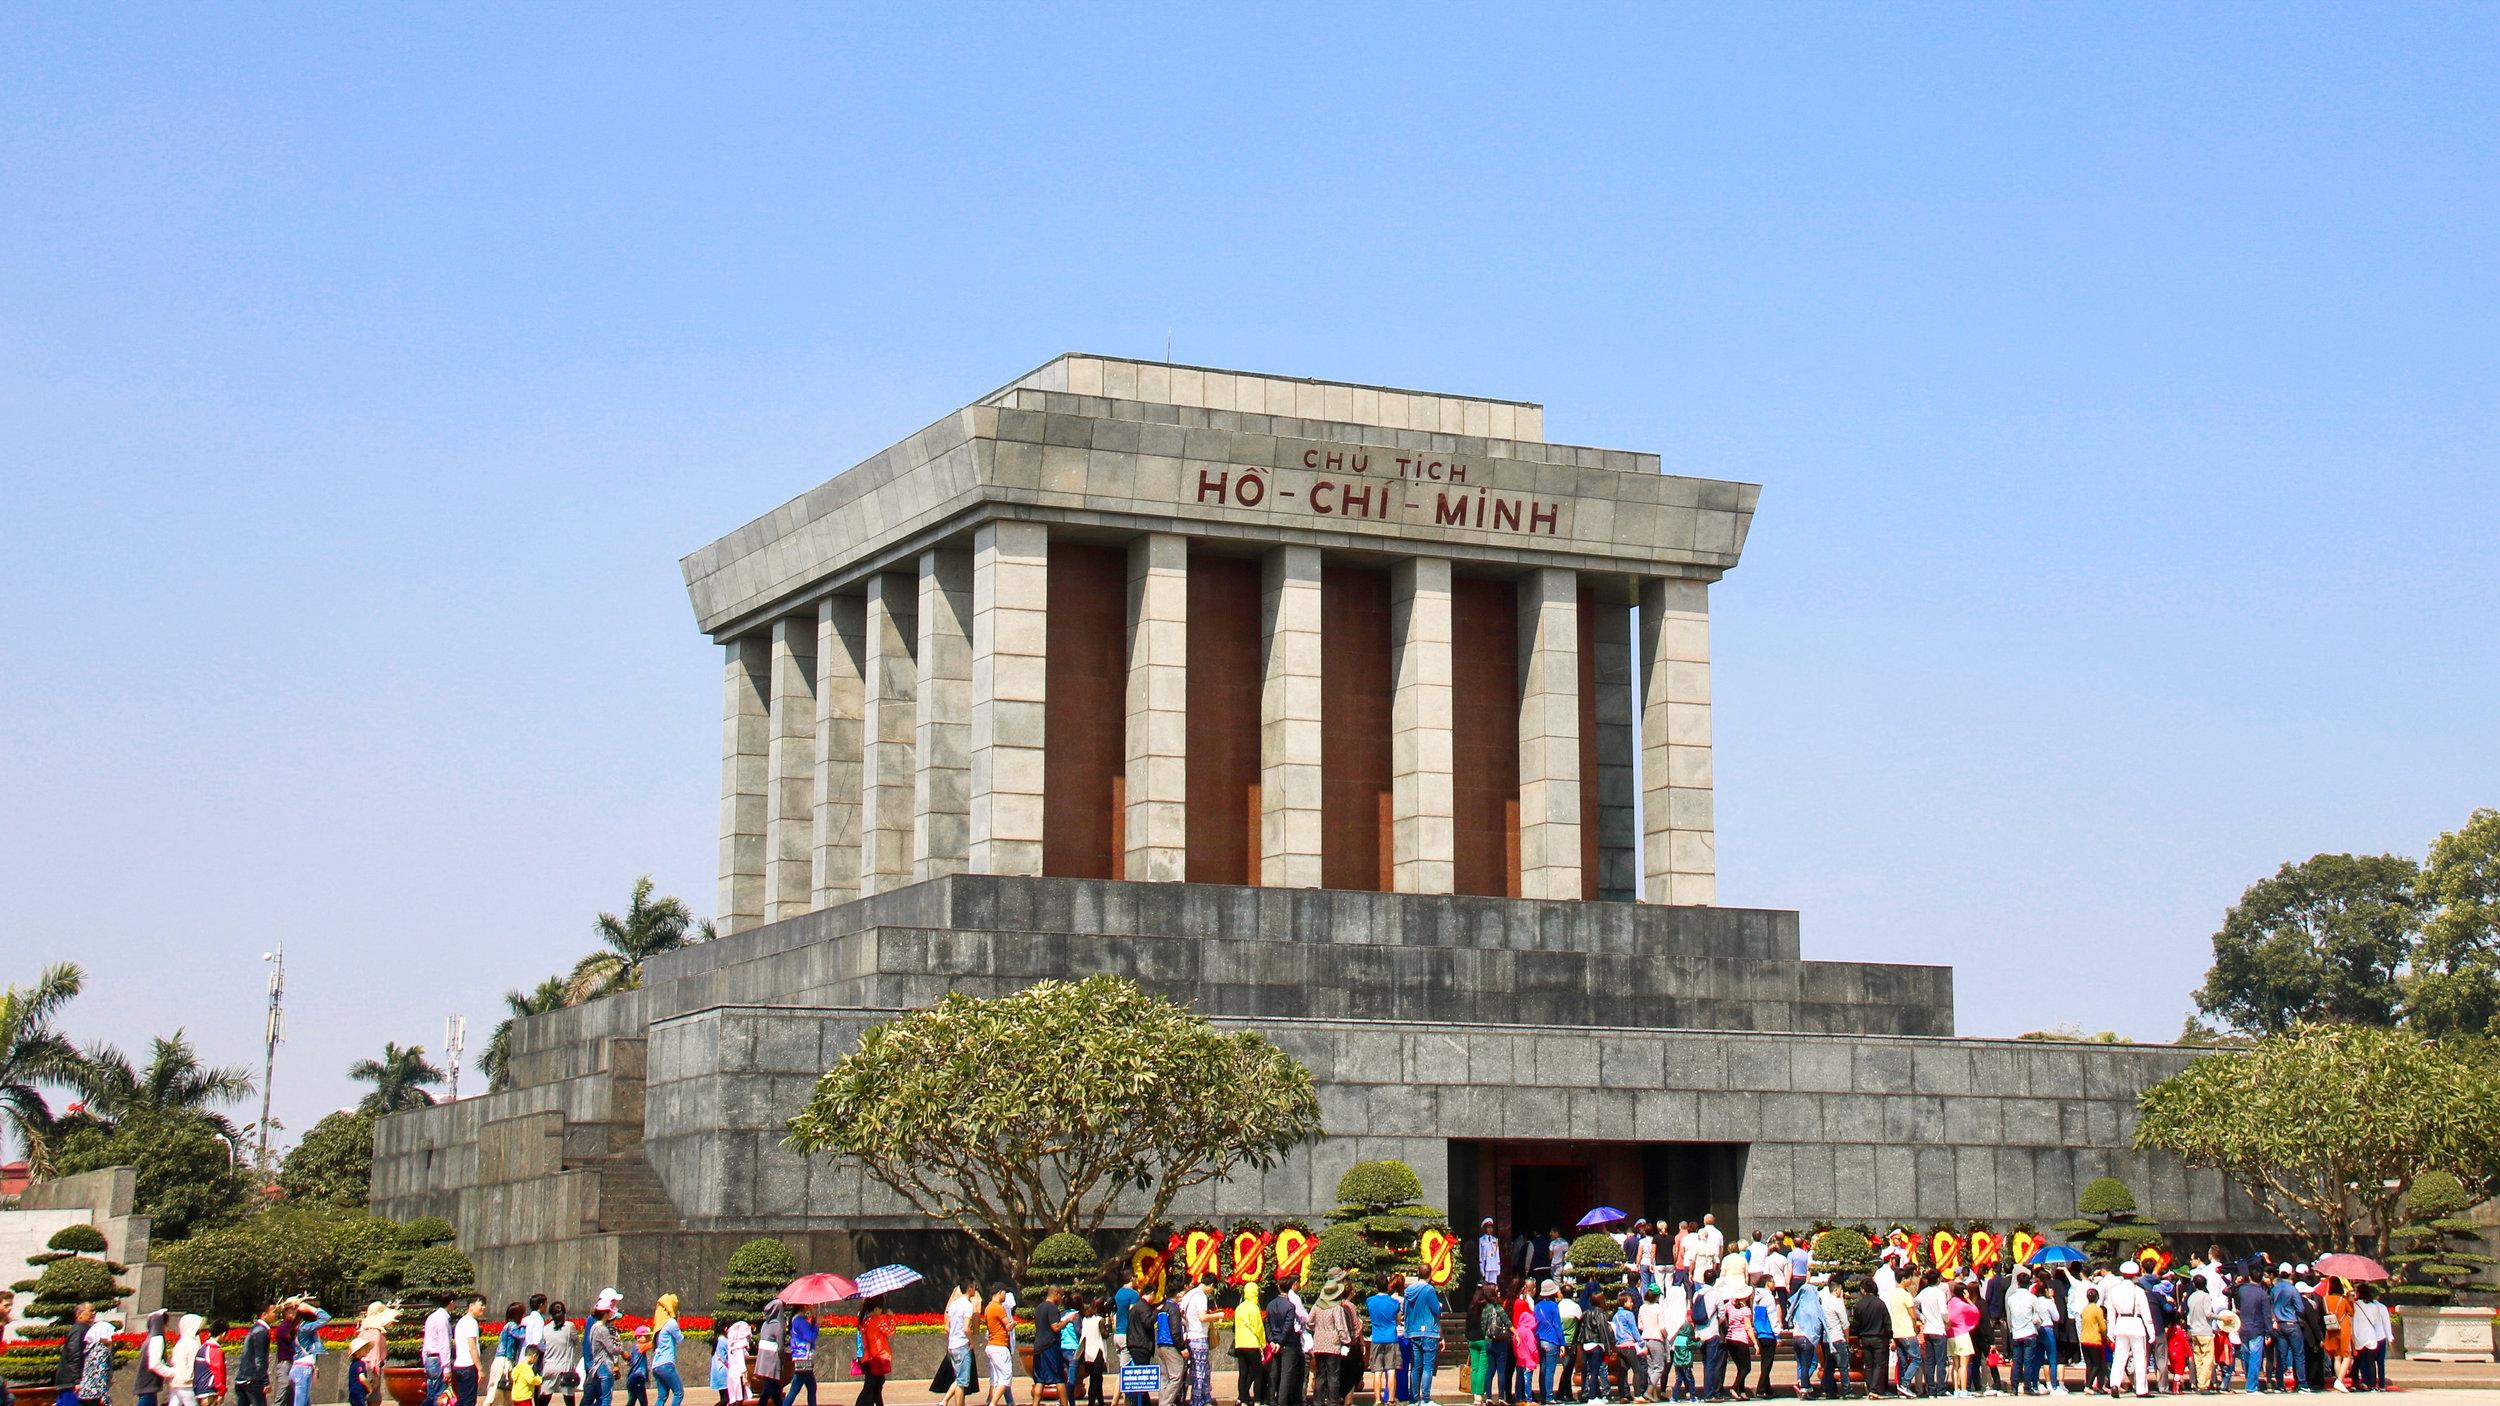 Ho Chi Minh Mausoleum, Hanoi, Vietnam. Across Land & Sea